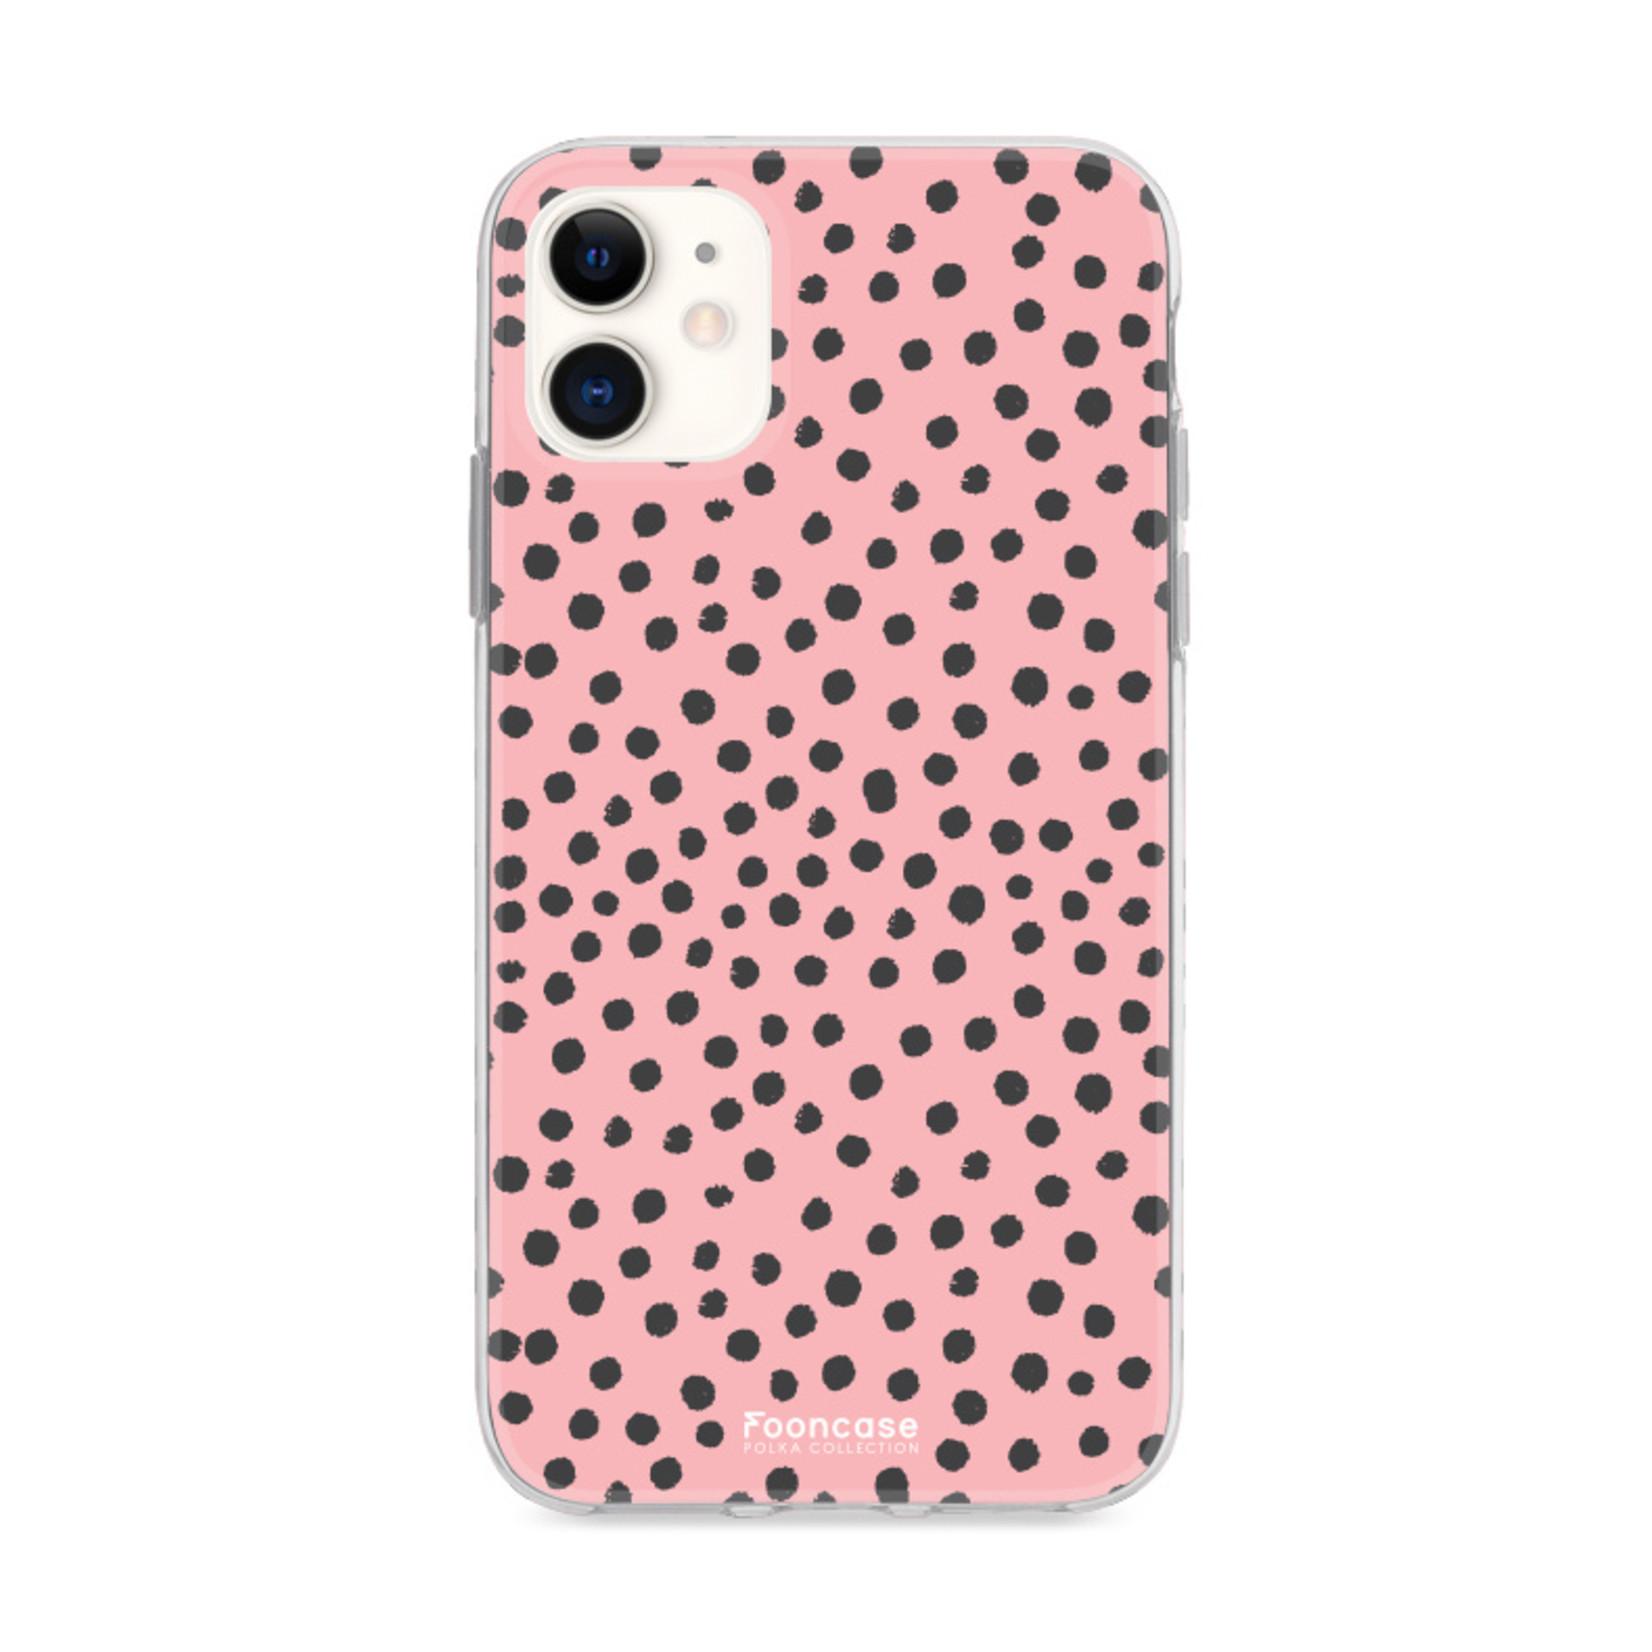 FOONCASE iPhone 11 hoesje TPU Soft Case - Back Cover - POLKA COLLECTION / Stipjes / Stippen / Roze